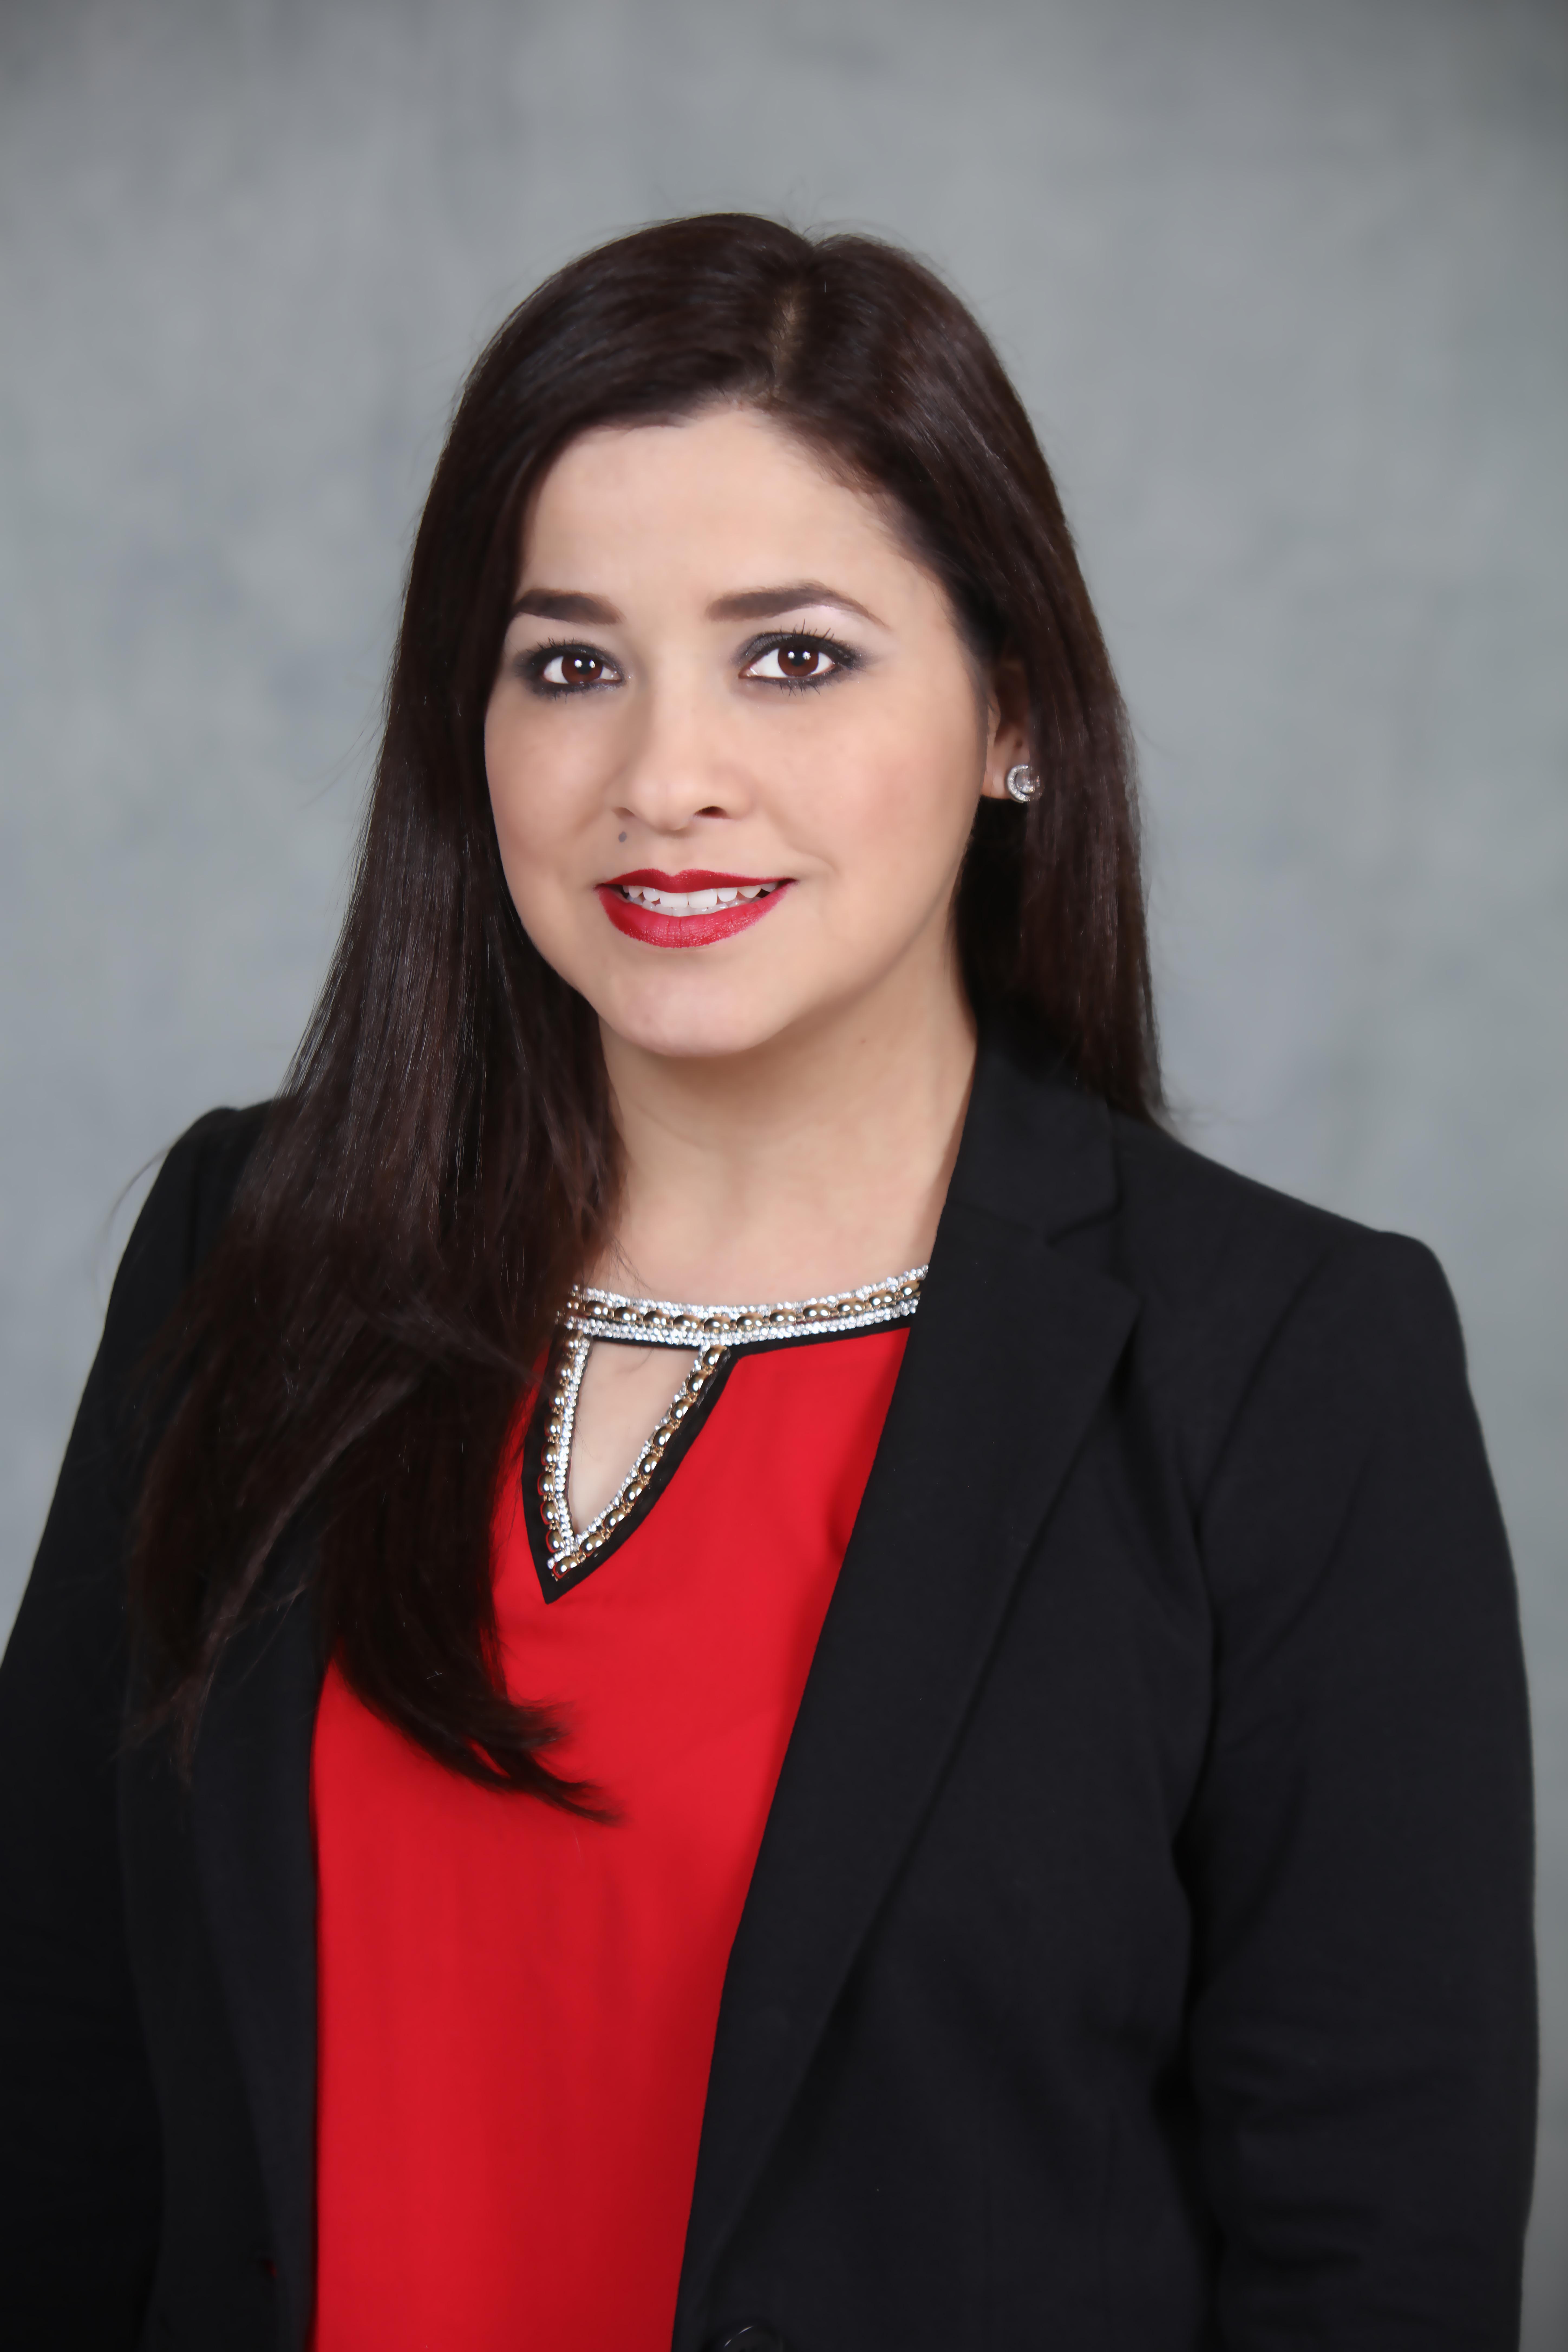 Rosalinda Garza-Lara Austin